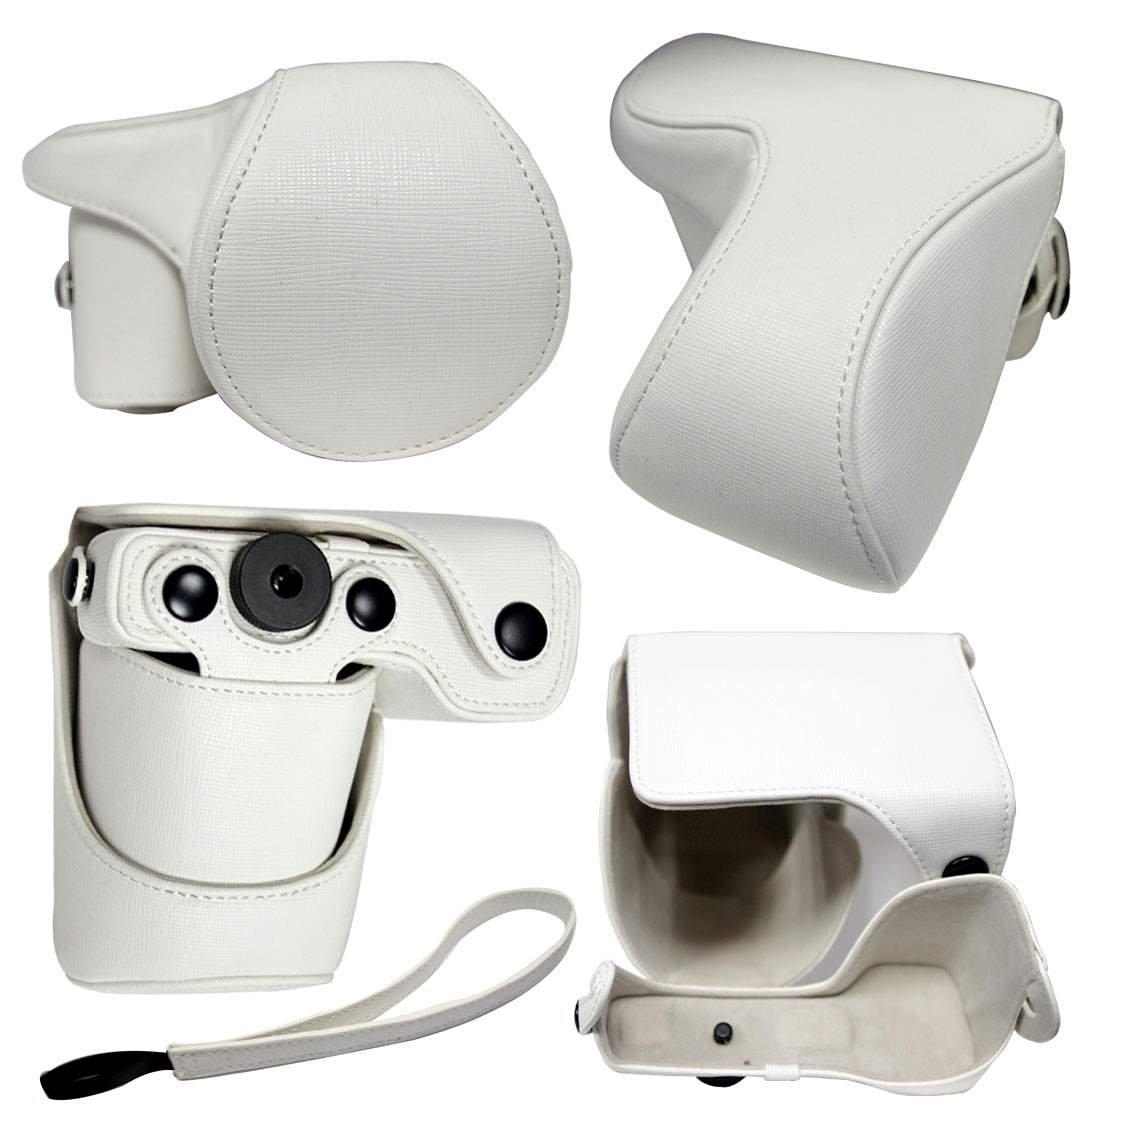 WP23: leather case bag to Sony Alpha NEX-3 NEX3A/R NEX-3A NEX-3K/S NEX3KSK1 digital camera